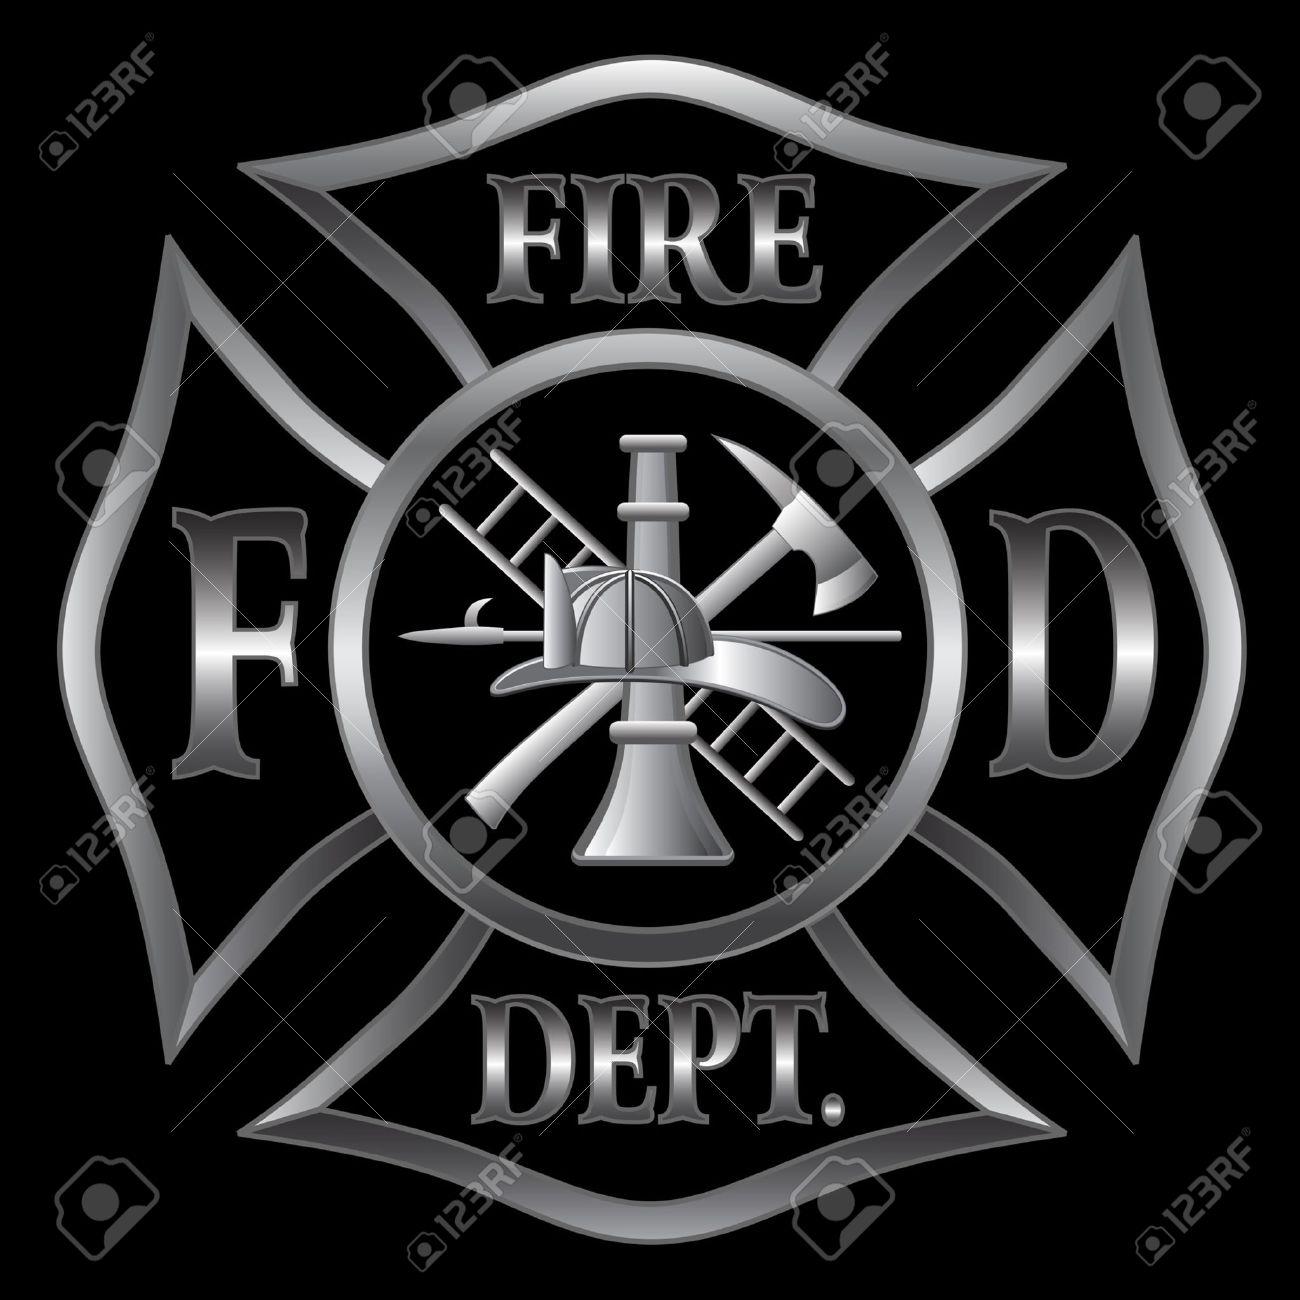 Fire department or firefighter s maltese cross symbol in silver fire department or firefighter s maltese cross symbol in silver on black background stock vector biocorpaavc